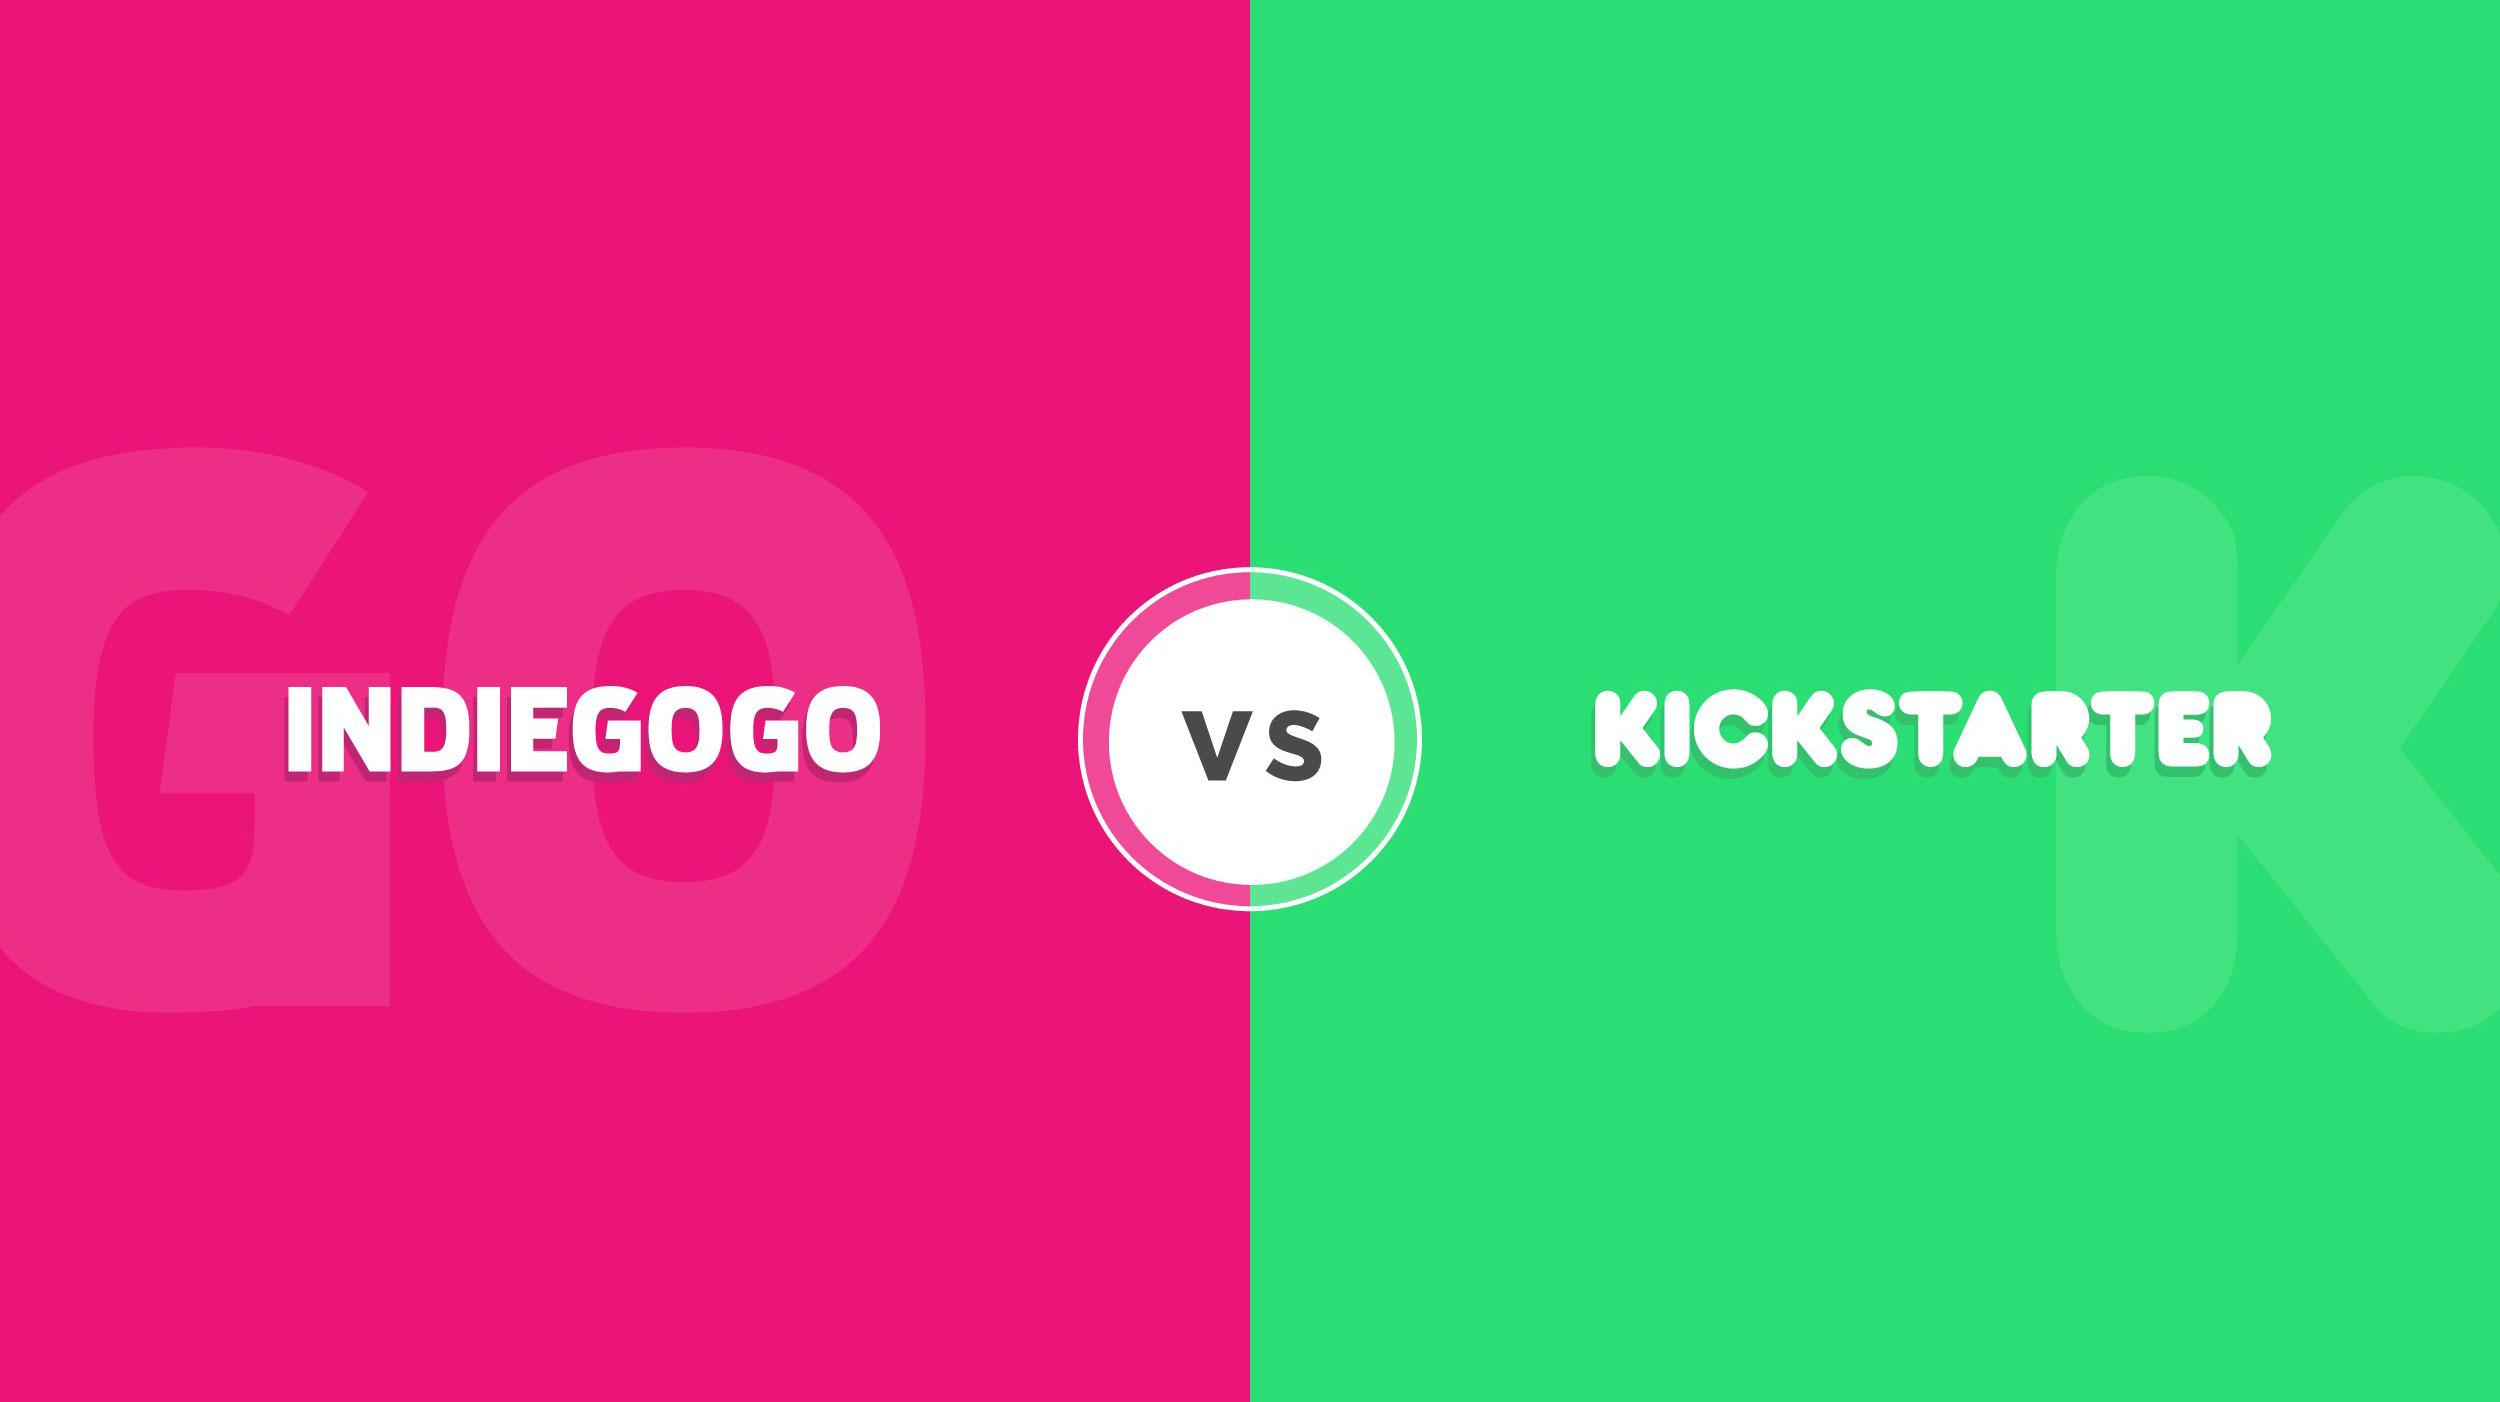 Kickstarter vs. Indiegogo (Updated October 2019)